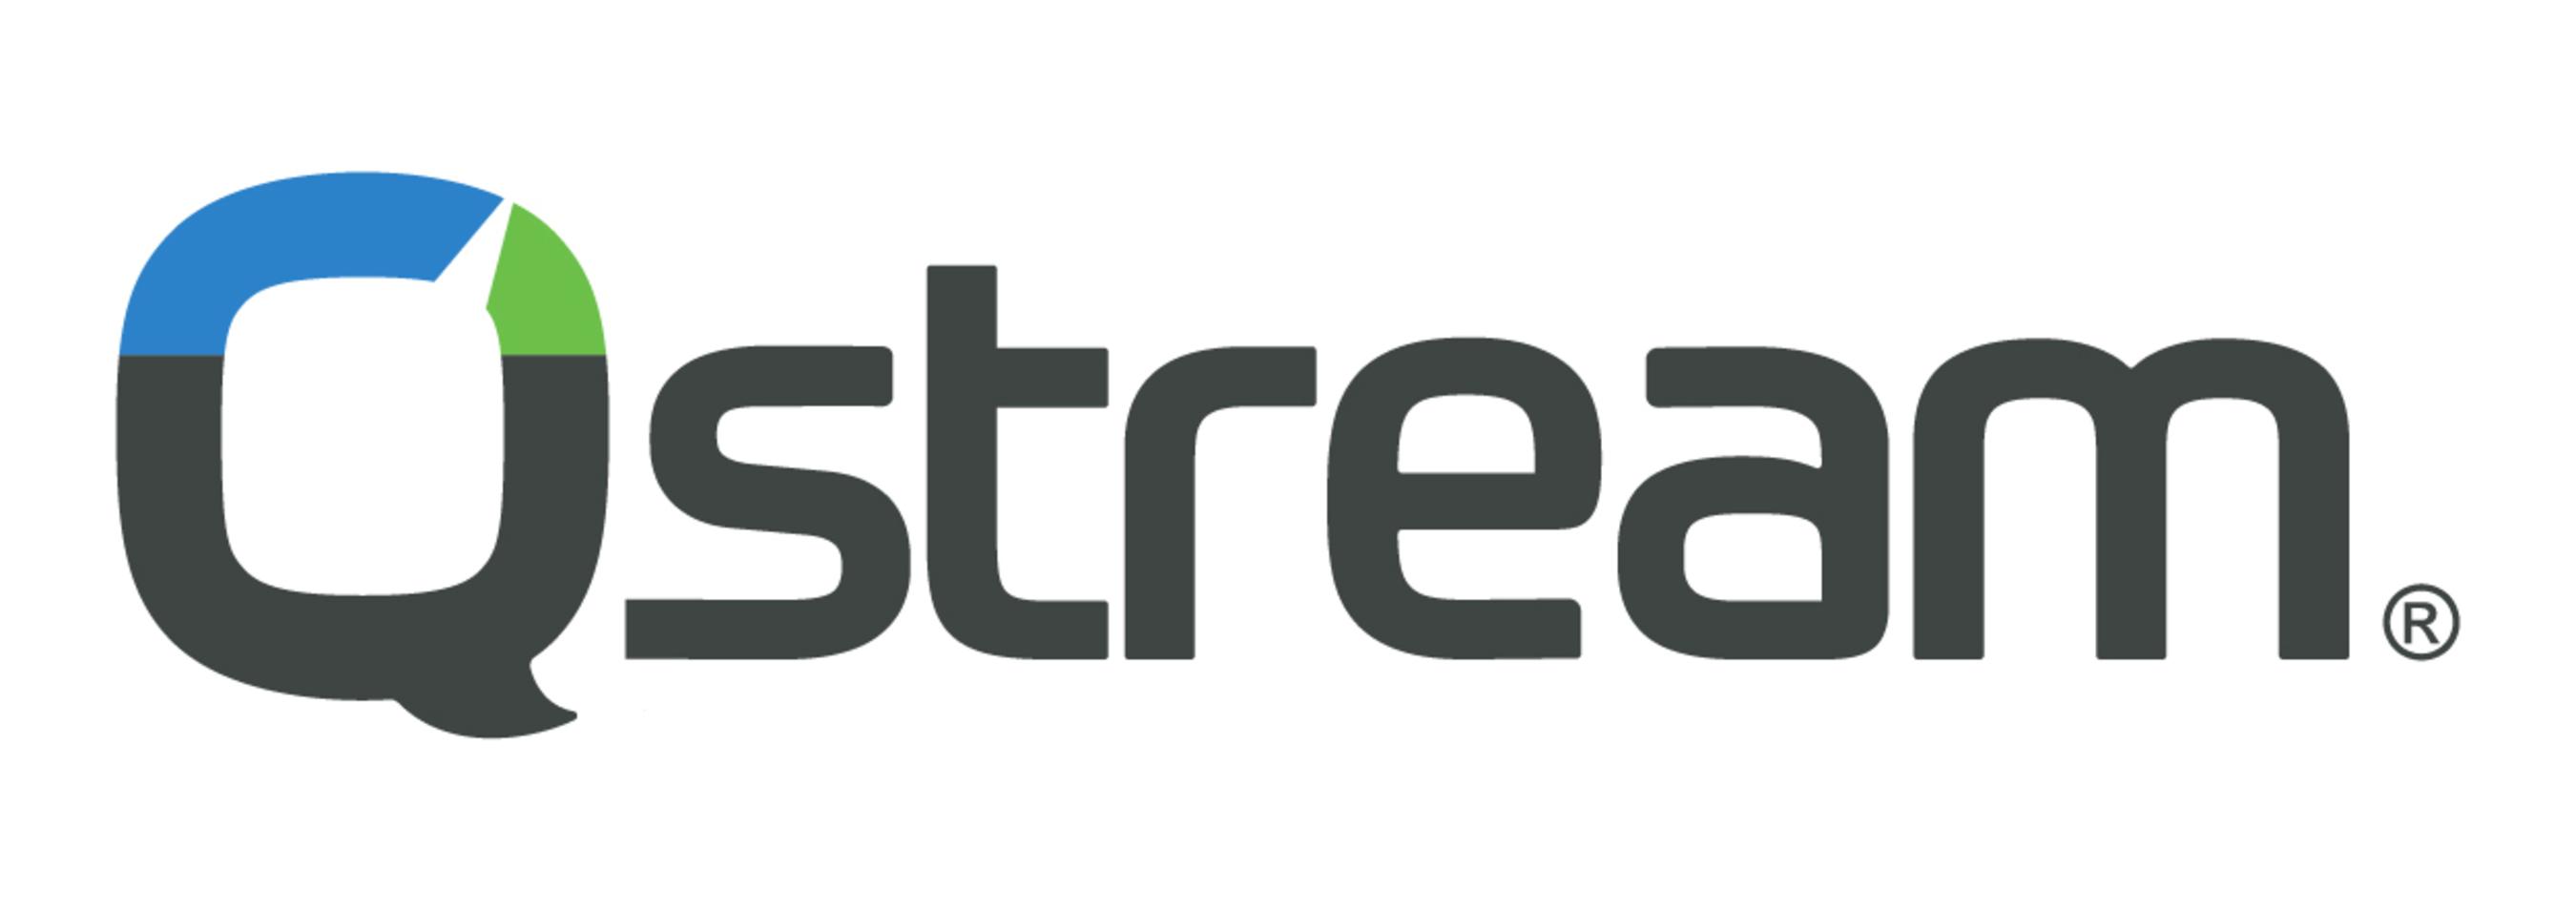 Qstream CEO, Duncan Lennox, to Present at TEDxUCD 2016 in Dublin